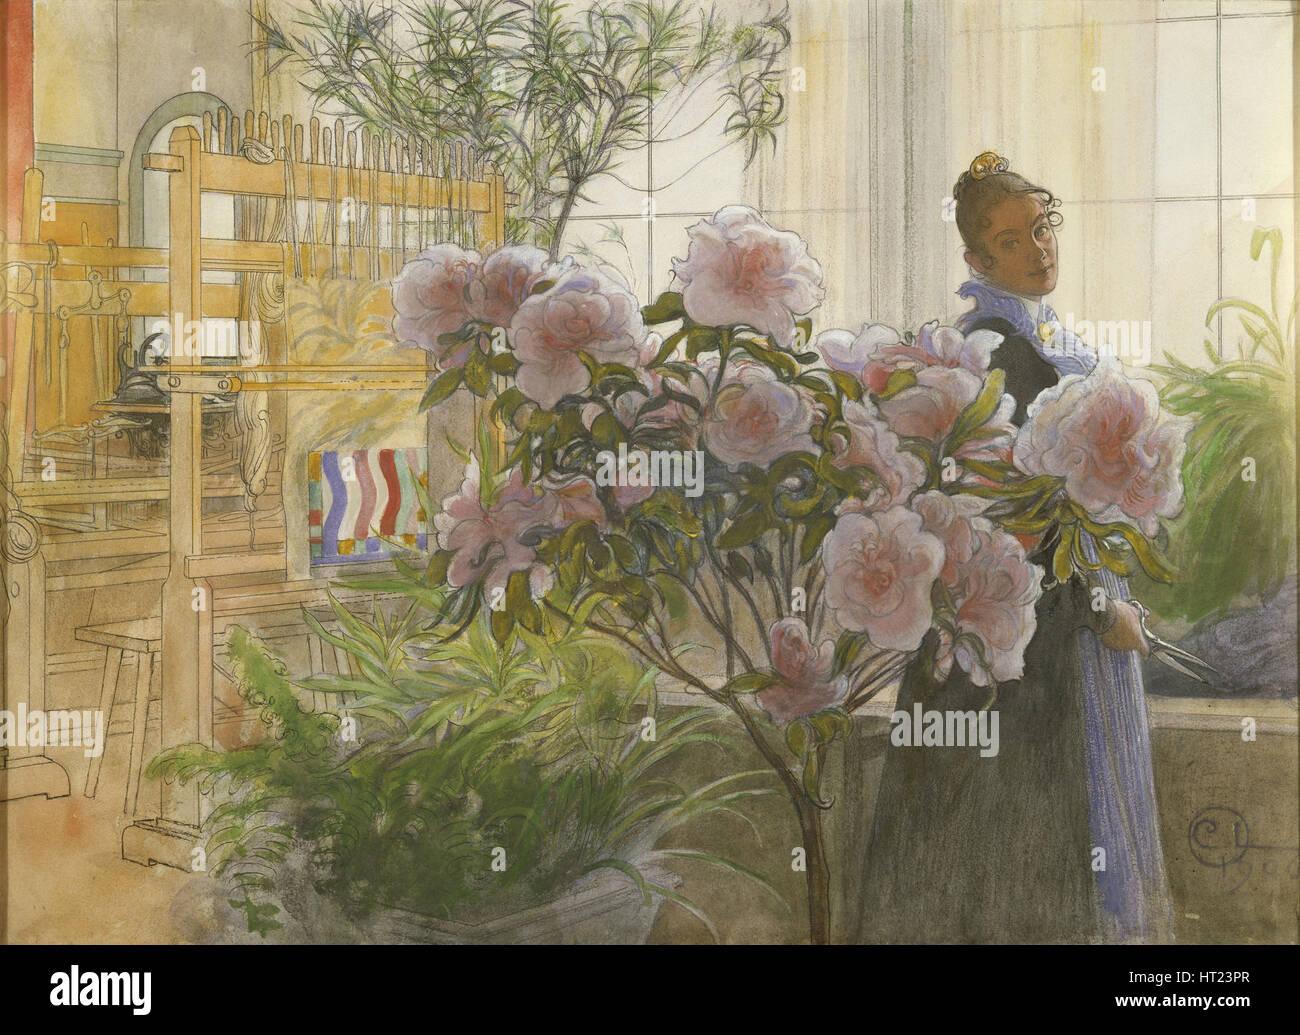 Azalea, 1906. Artist: Larsson, Carl (1853-1919) - Stock Image